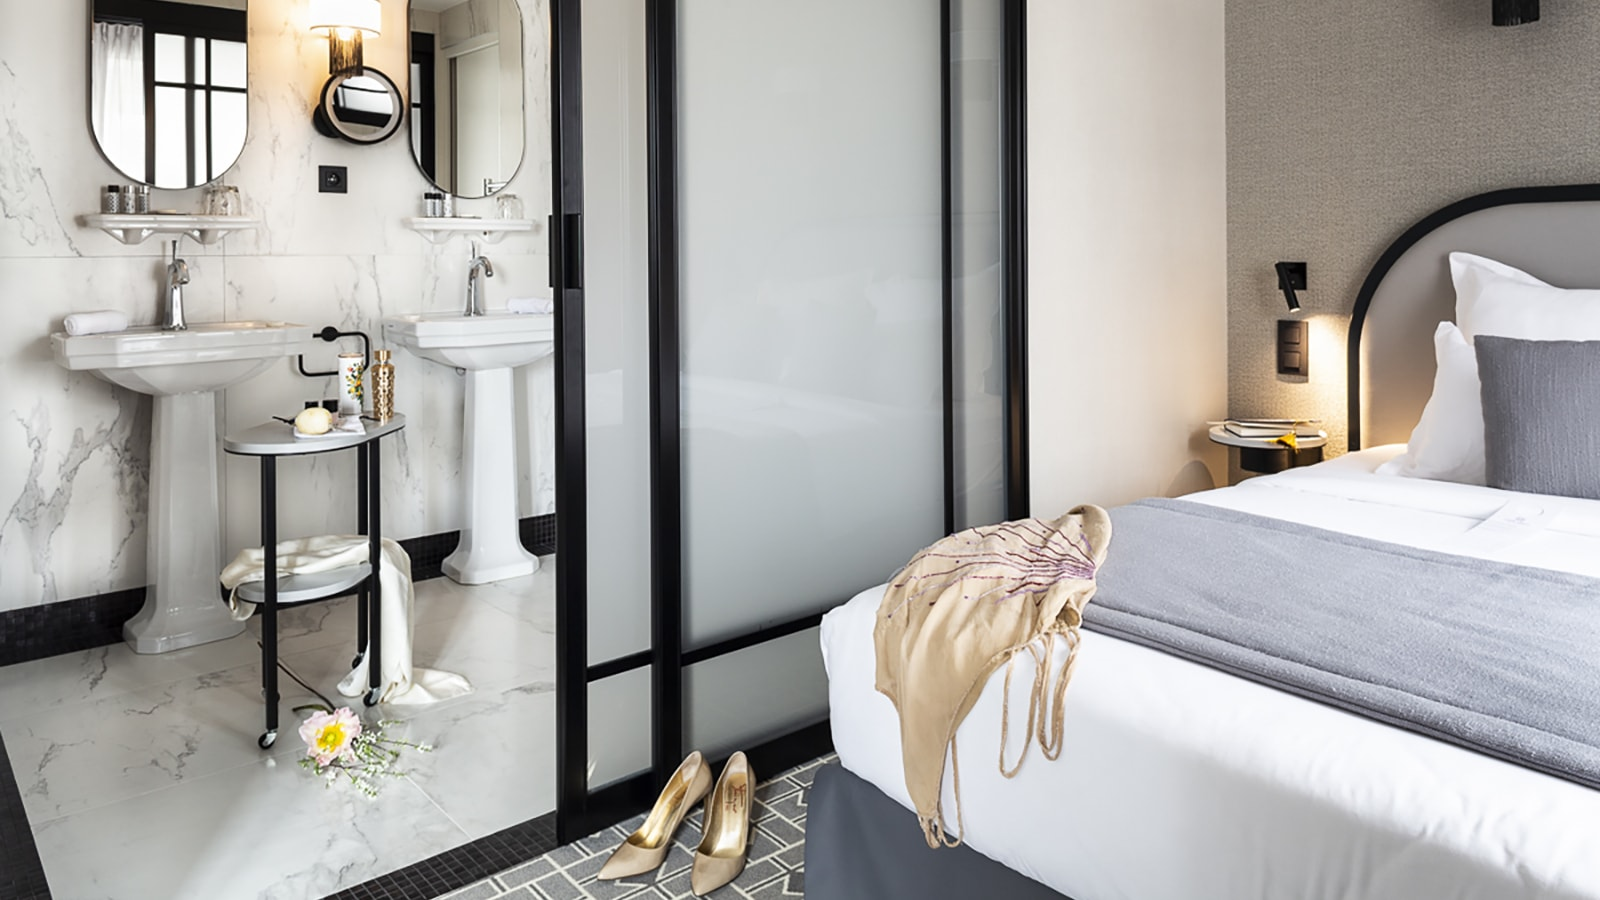 EFI Design Hotel Lenox Paris Efi Design (3) 1157